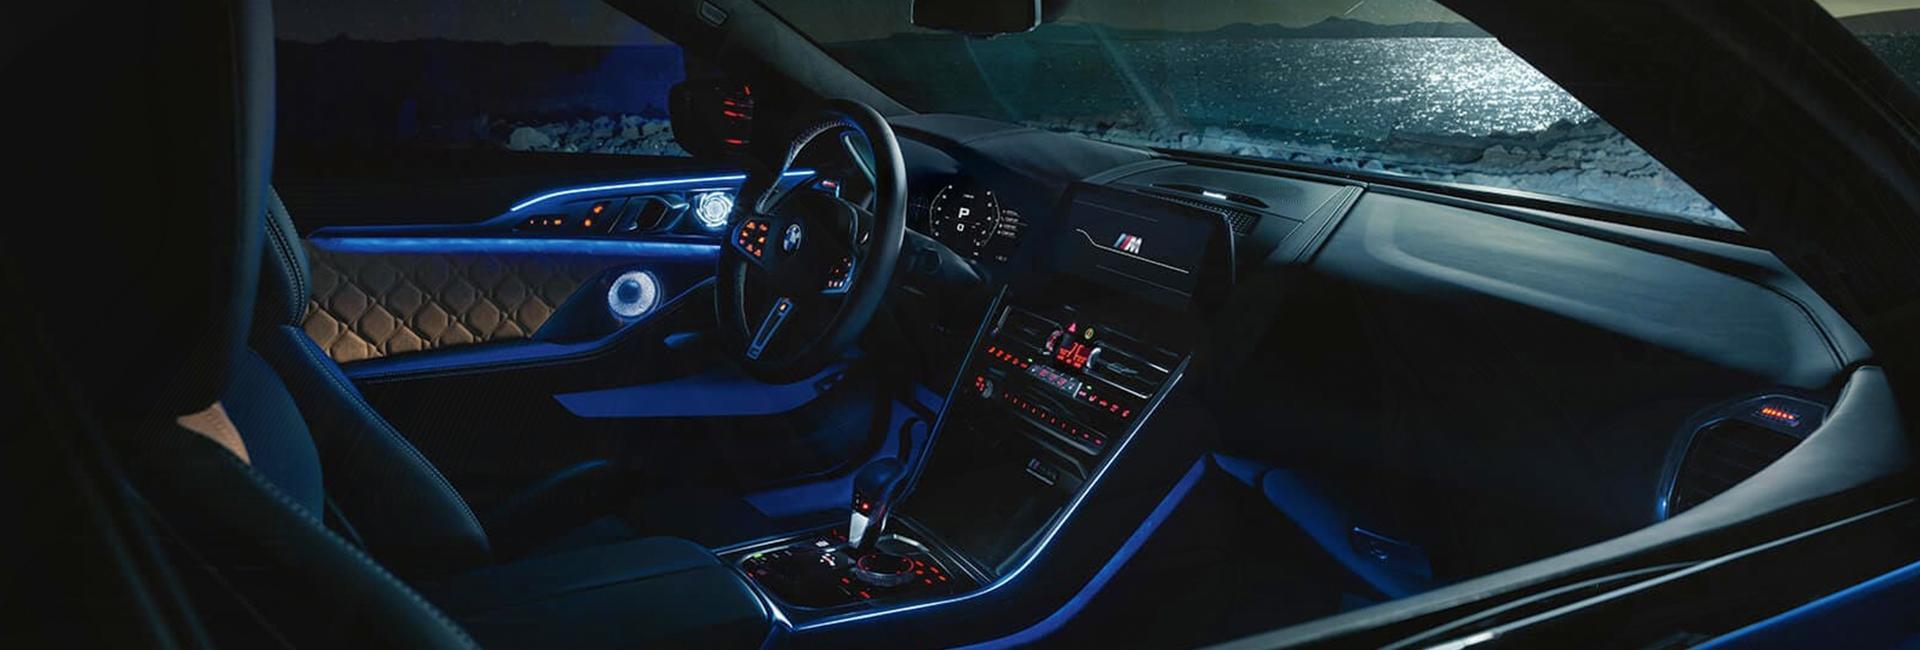 Interior image of the 2020 BMW M8